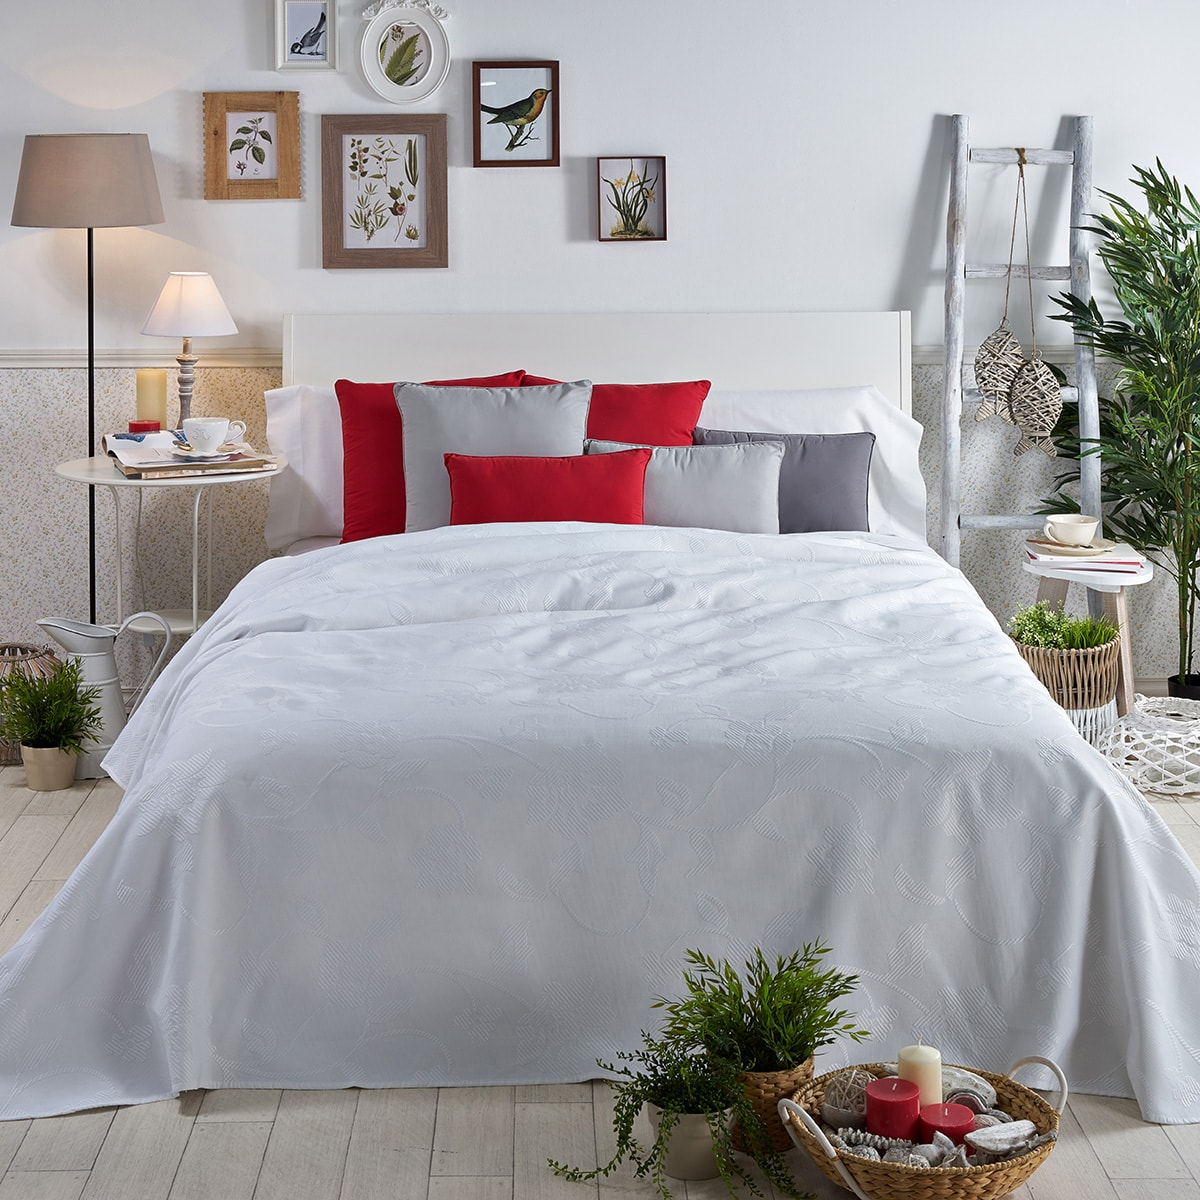 Colchas para camas de todos los estilos colch n expr s - Colchas para camas de 150 ...